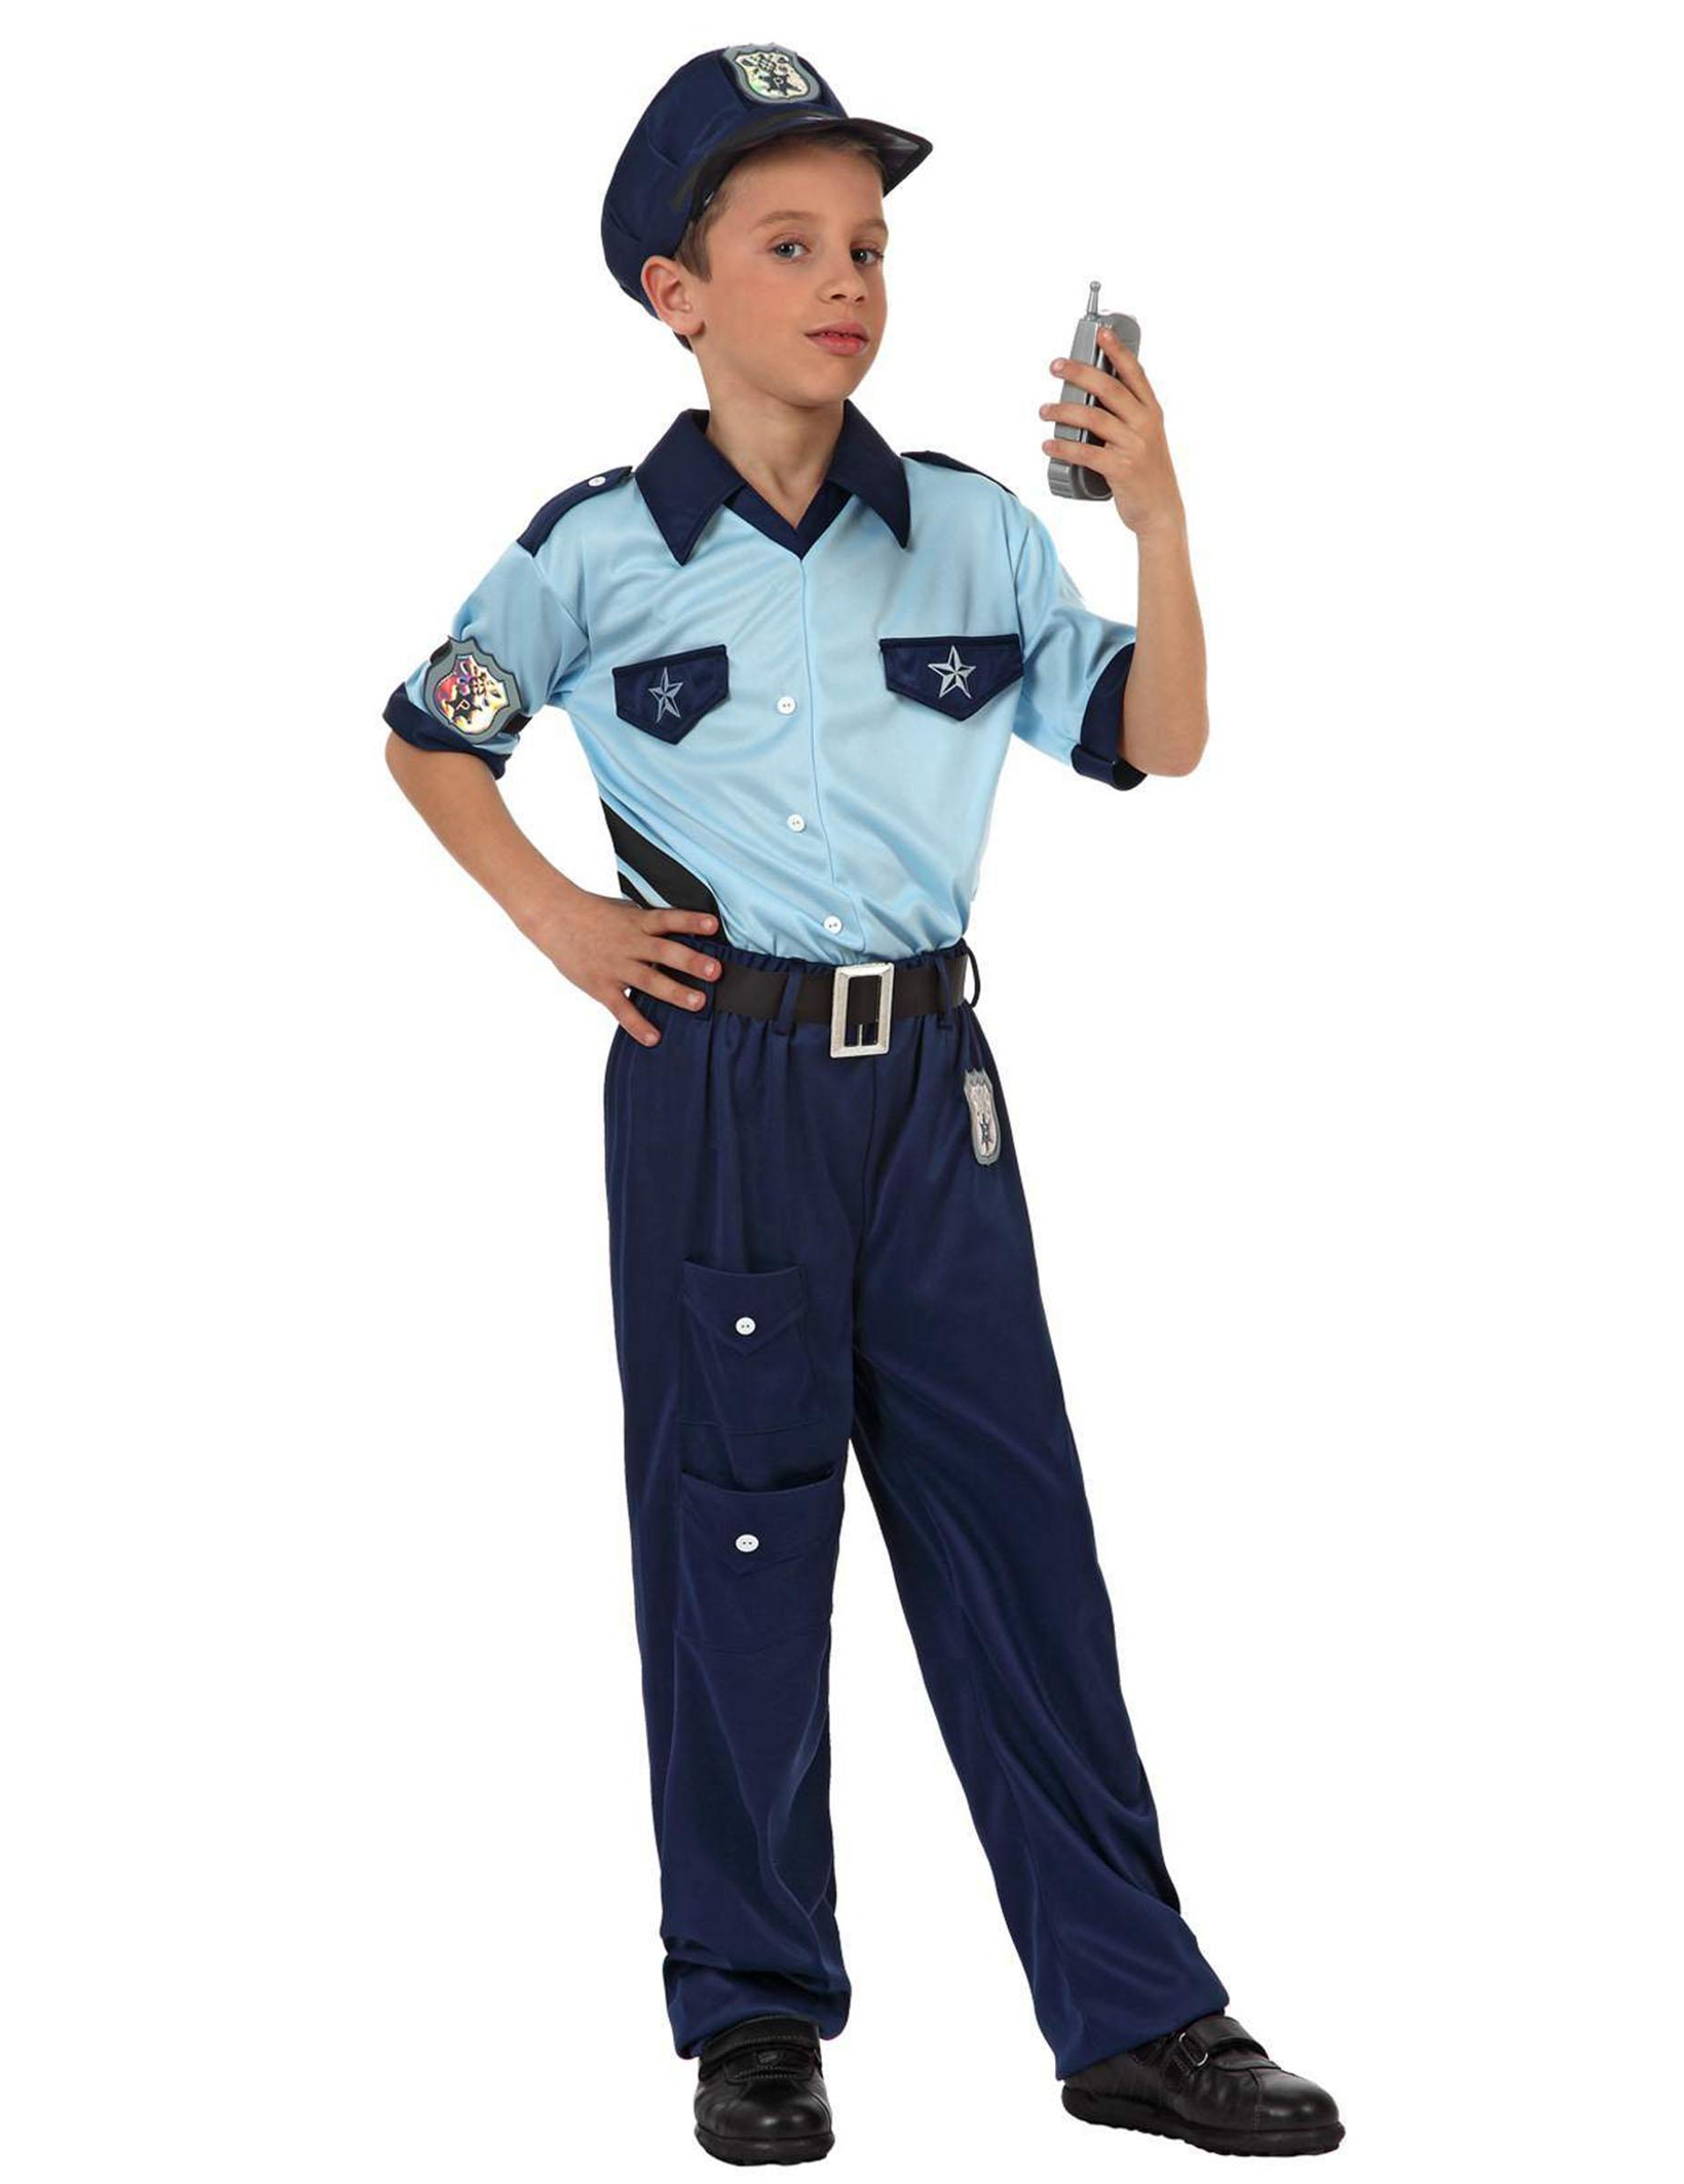 Déguisement policier bleu garçon   Deguise-toi, achat de ... 73cbe44a8188